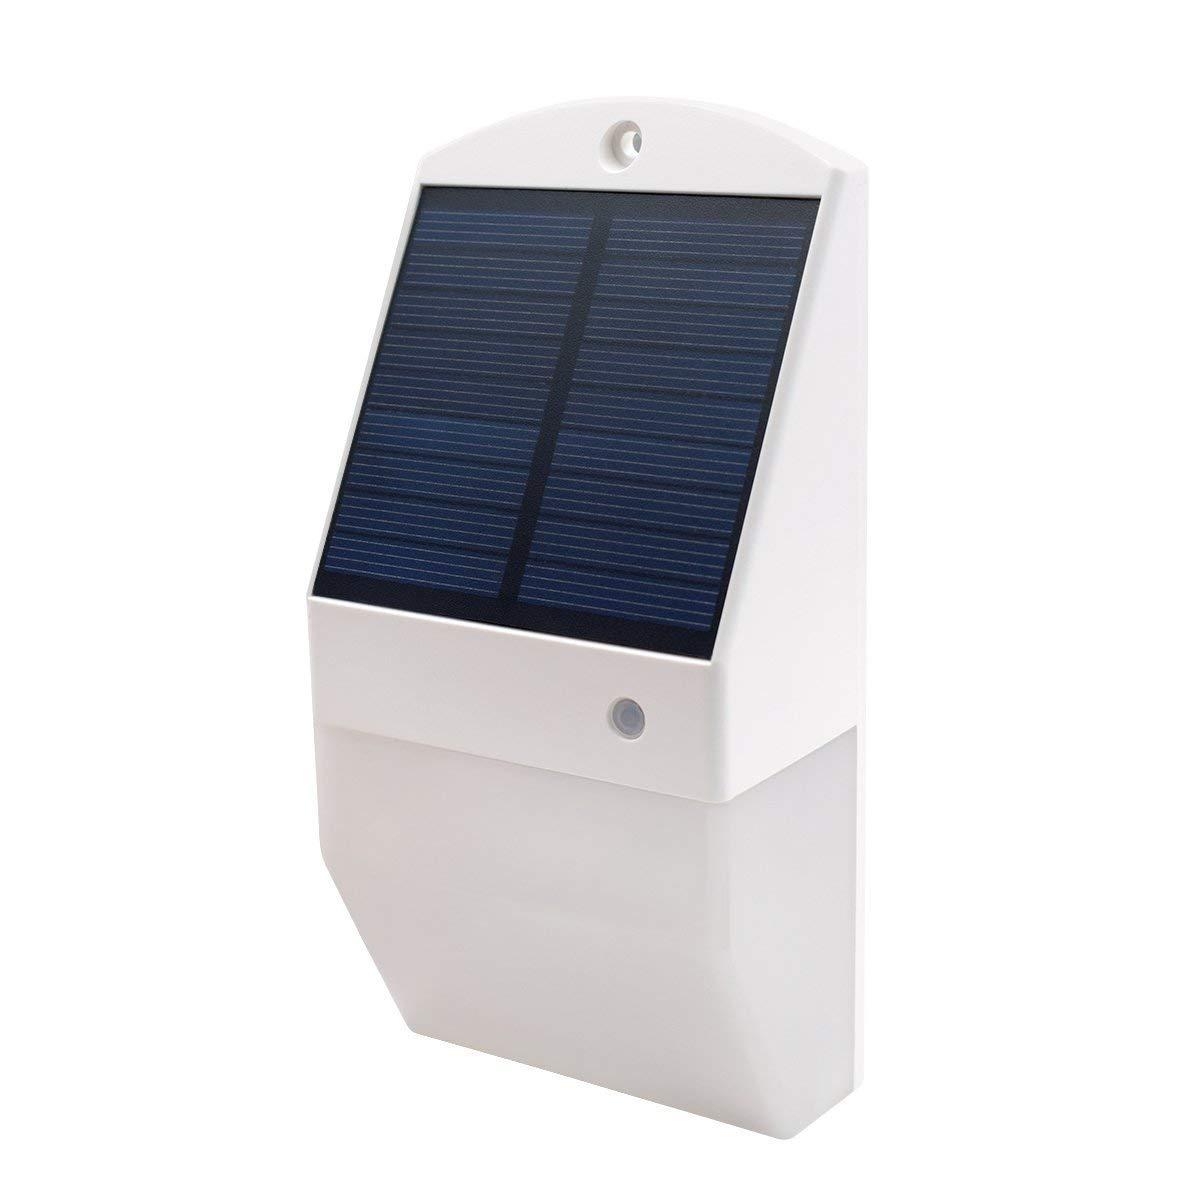 NUNET Solar Led Lights Outdoor, Wireless 25 Solar Led Motion Sensor Lights, IP65 Waterproof Security Lights for Outdoor Backyard, Fence, Driveway, Garden, Garage etc.